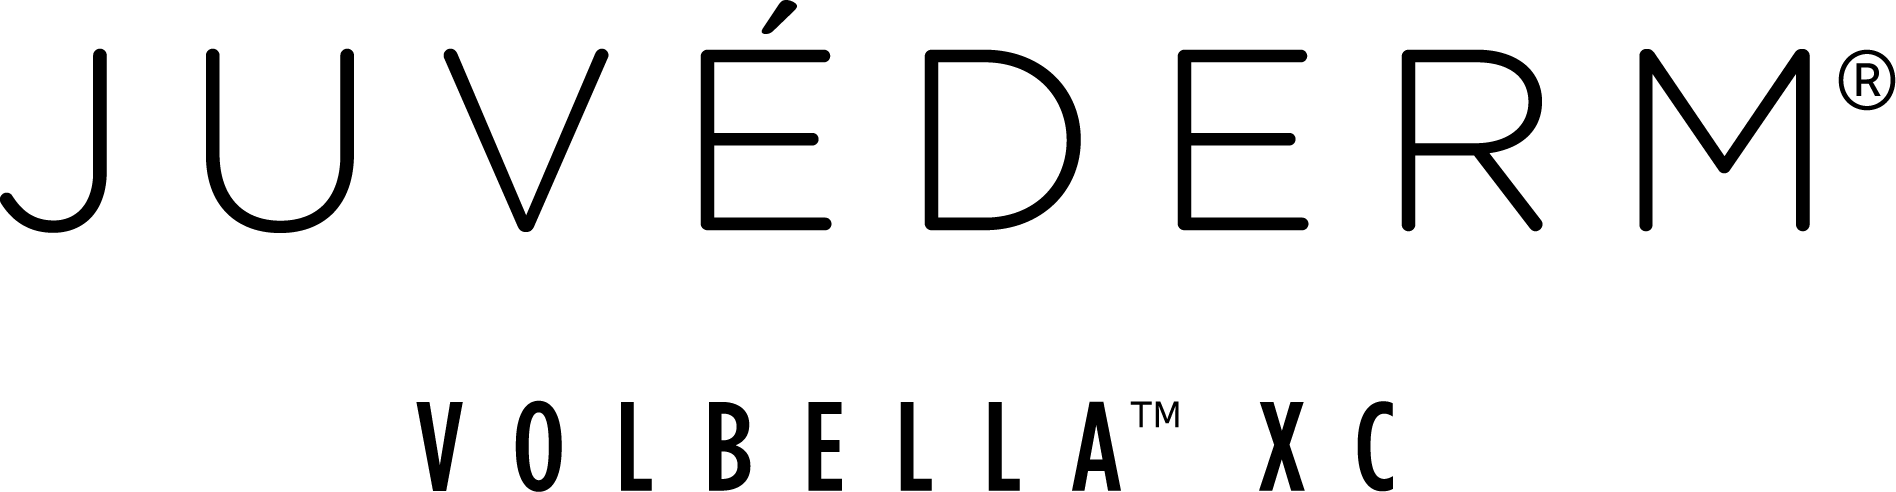 Juvederm Volbella XC Logo